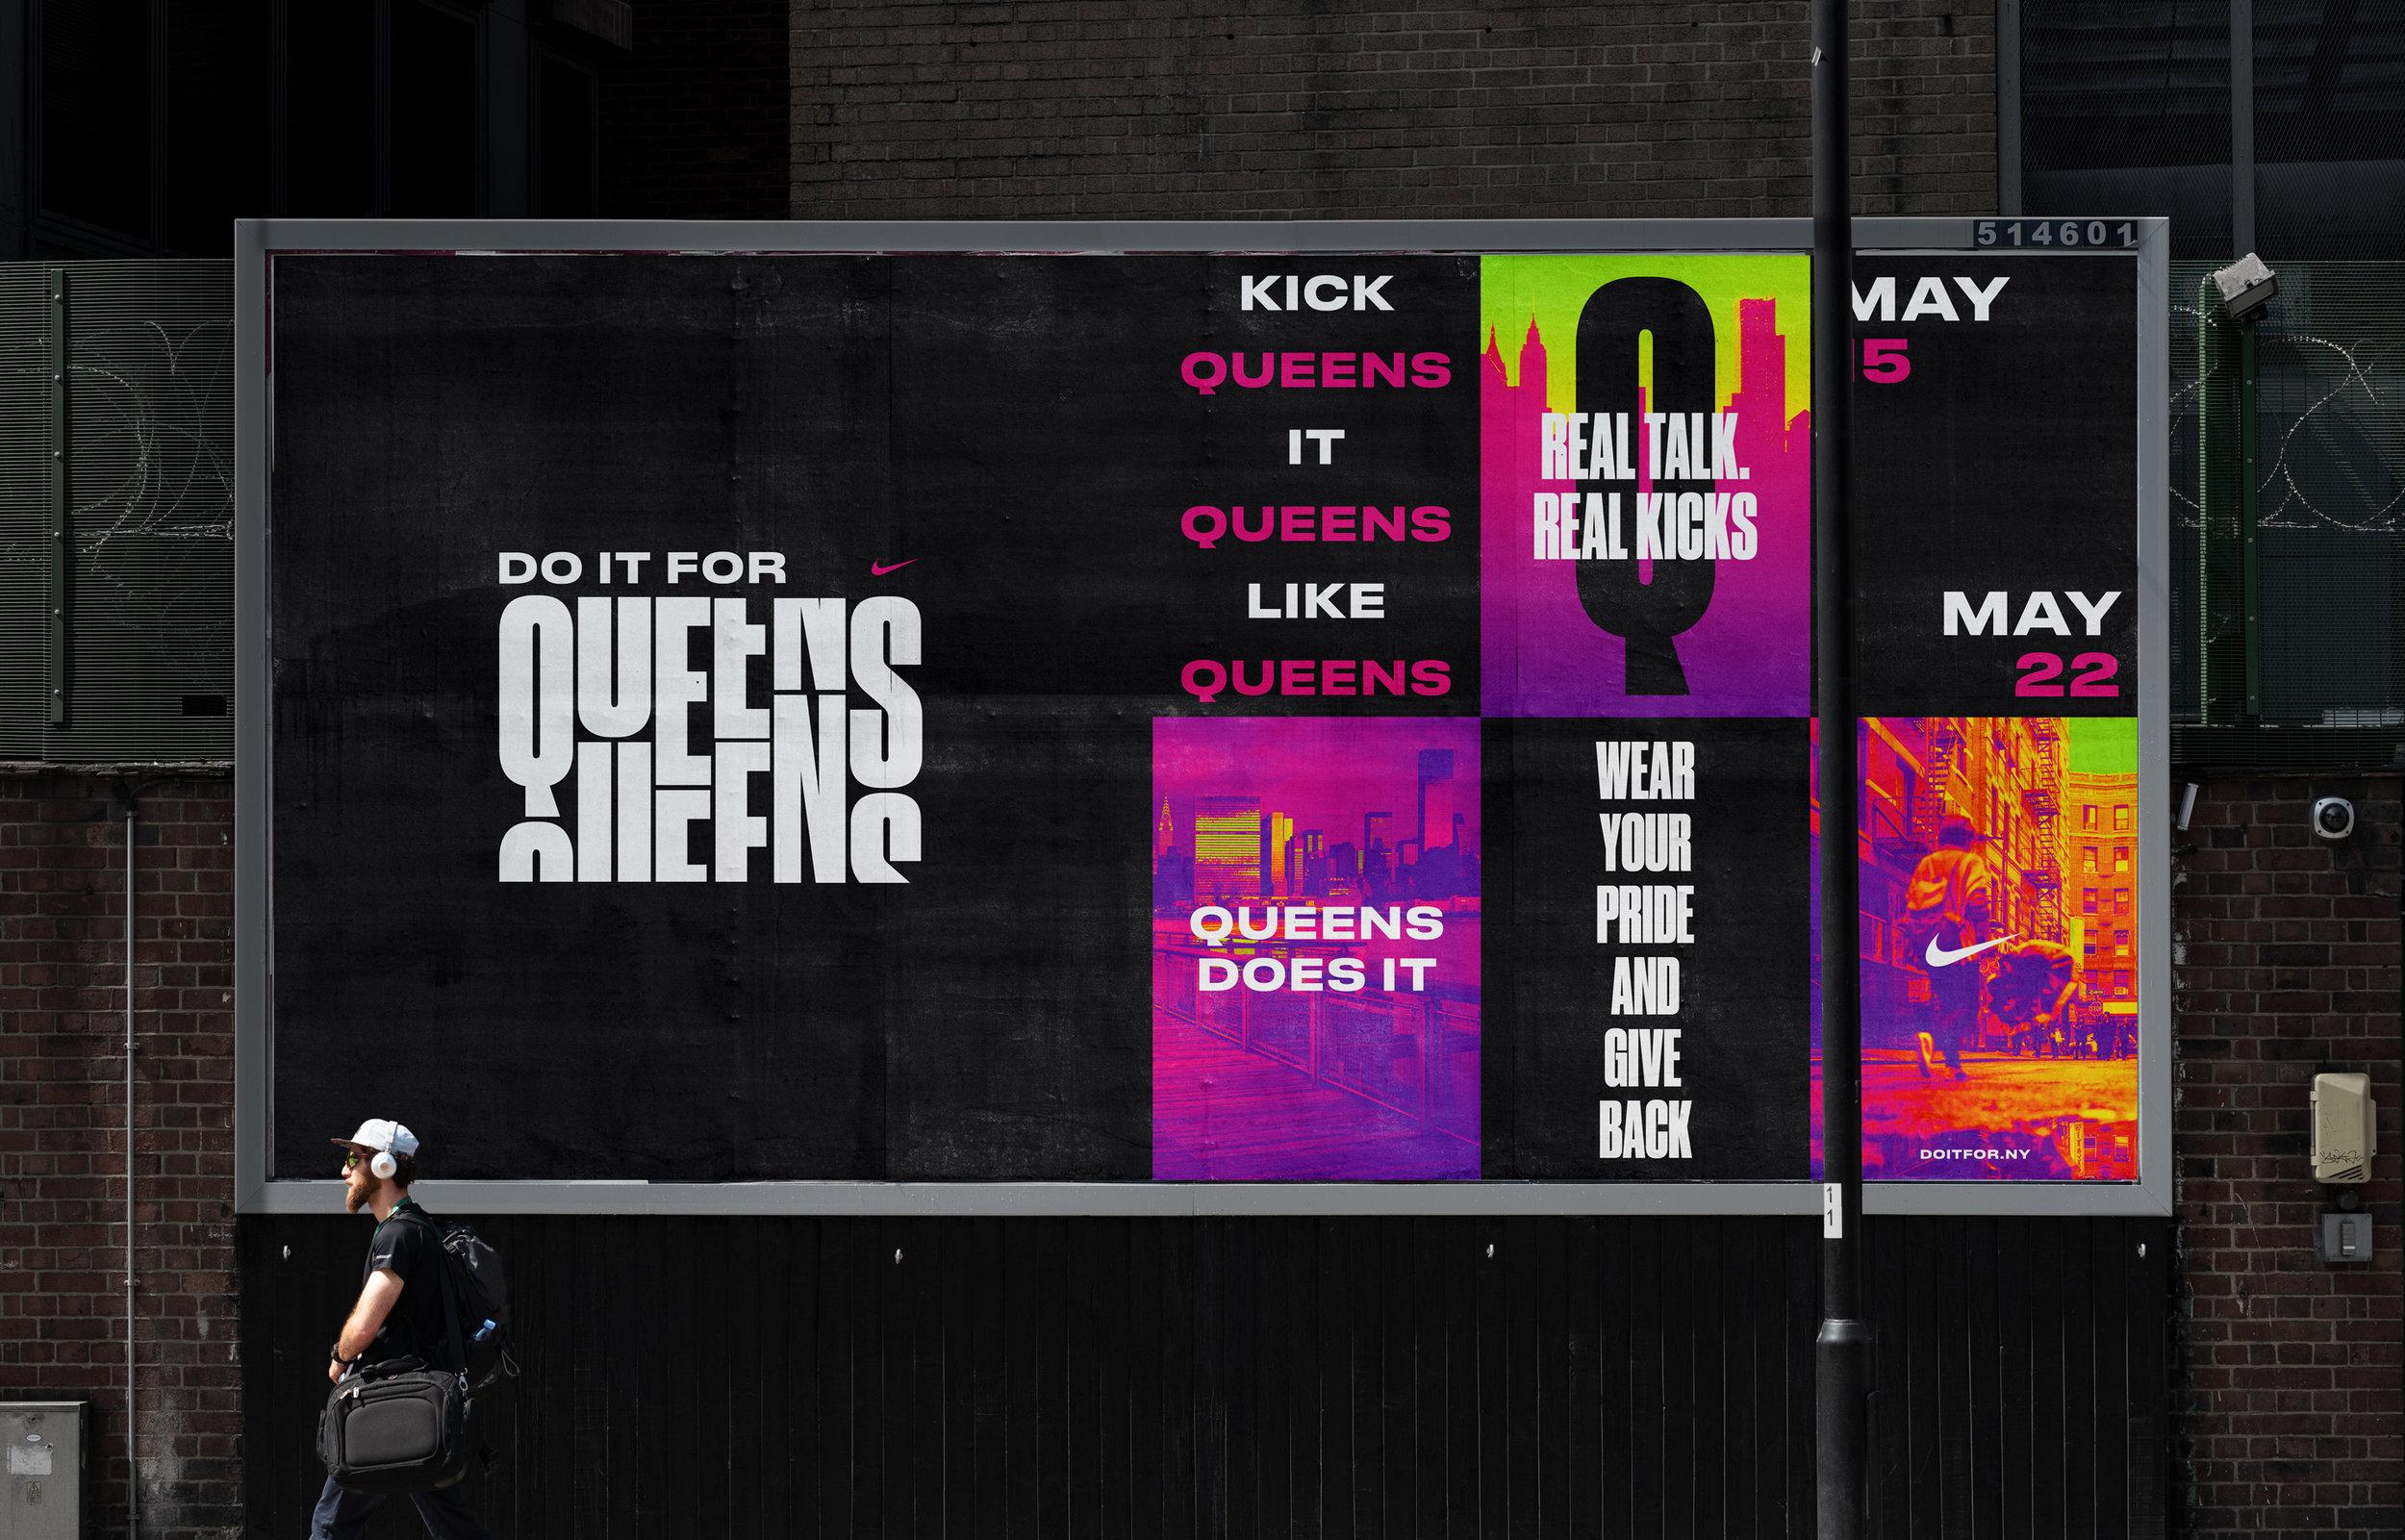 SH19_Nike_Billboard_Lockup_Queens.jpg